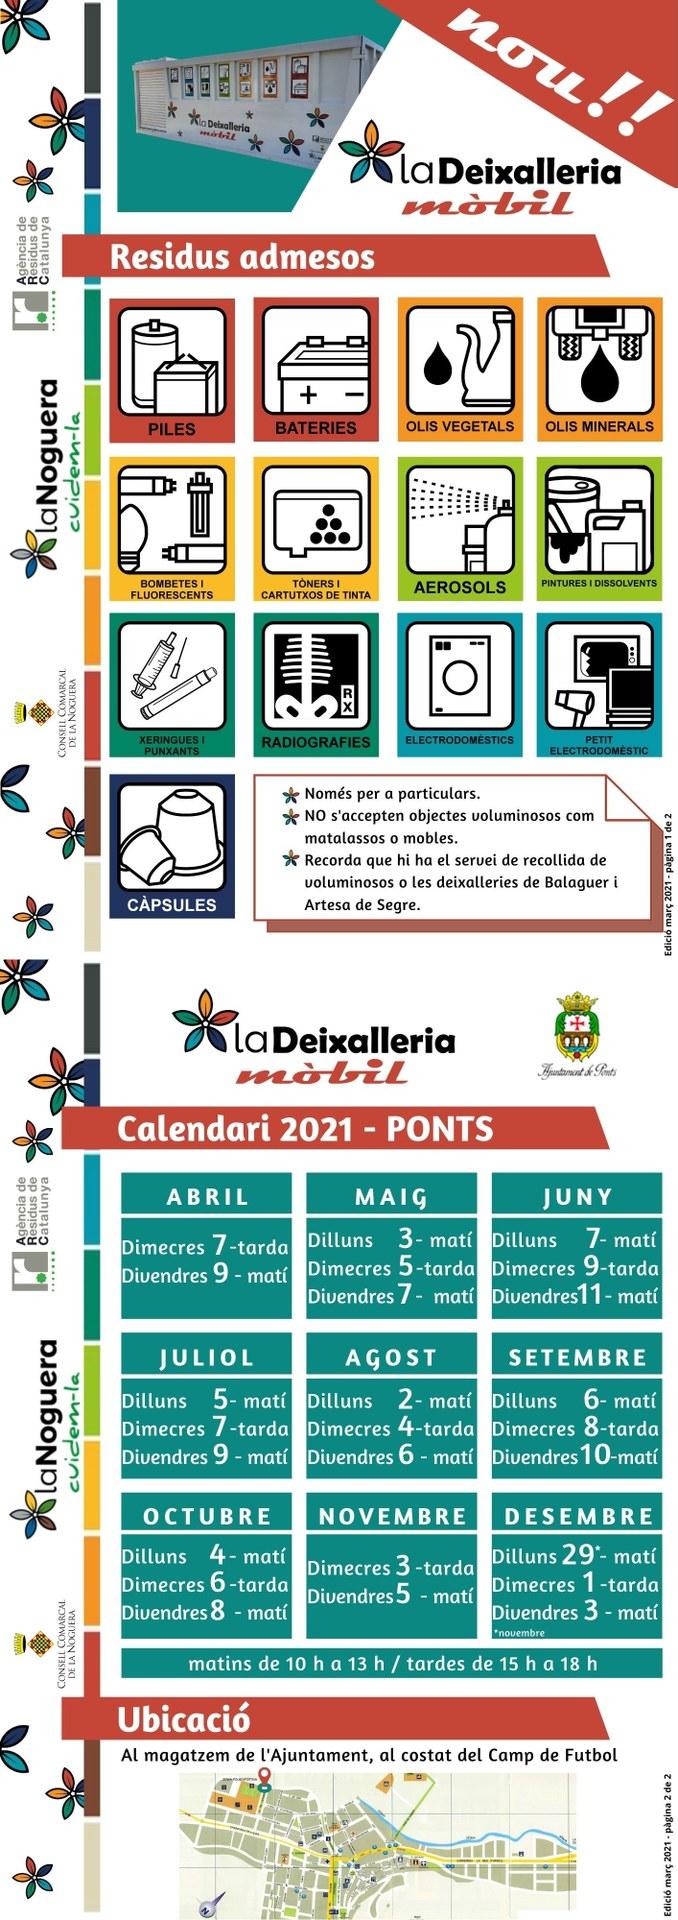 PONTS_Deixalleria mobil_tot.jpg